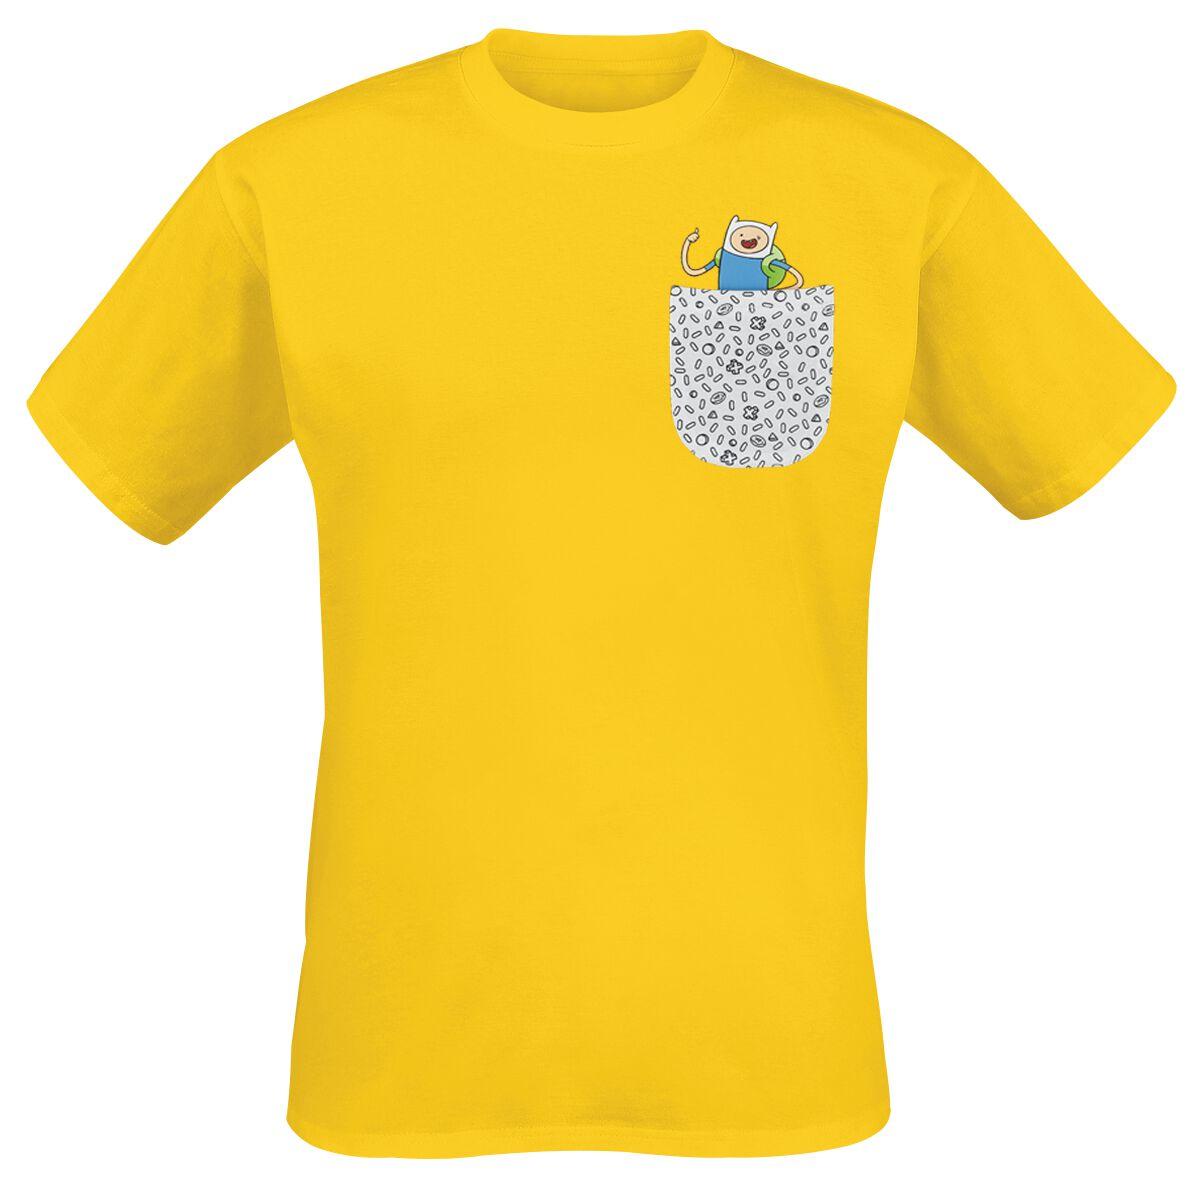 Merch dla Fanów - Koszulki - T-Shirt Adventure Time Jake & Finn T-Shirt żółty - 348943